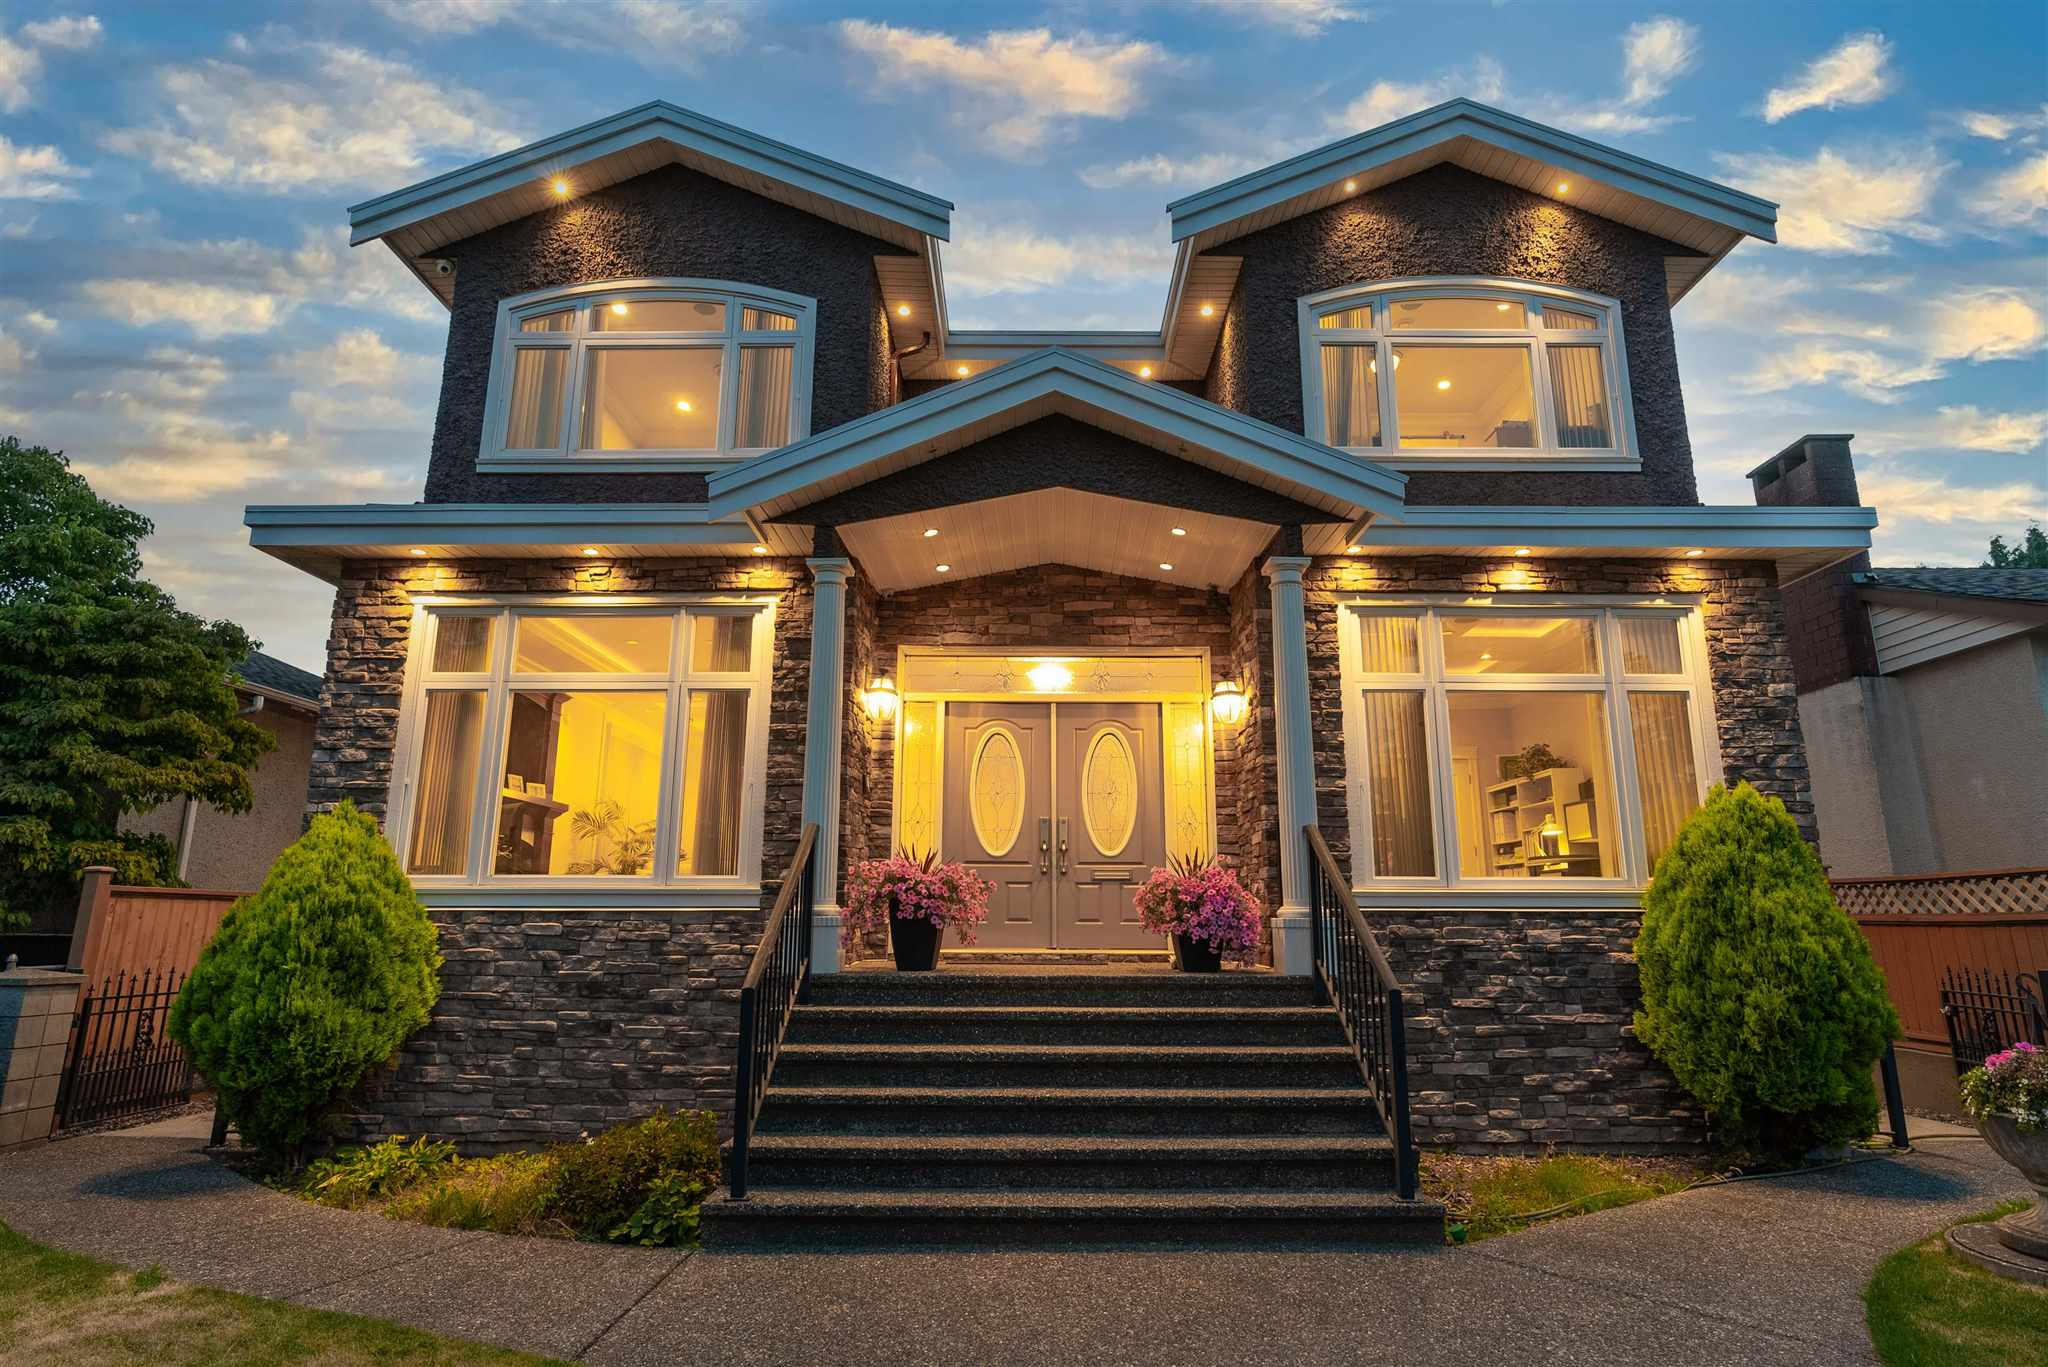 6611 RUPERT STREET - Killarney VE House/Single Family for sale, 6 Bedrooms (R2607169)